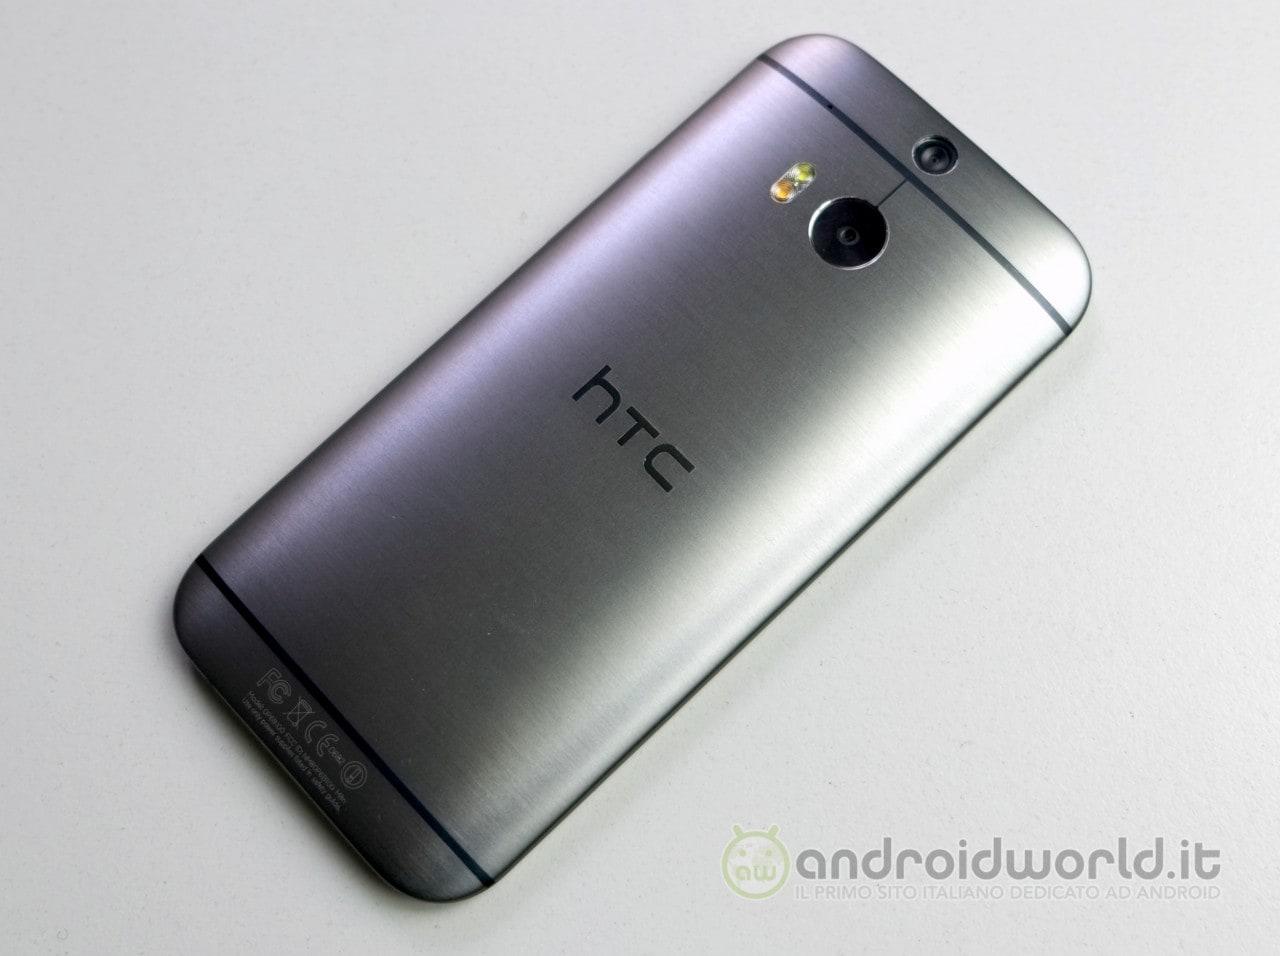 HTC One (M8) 10